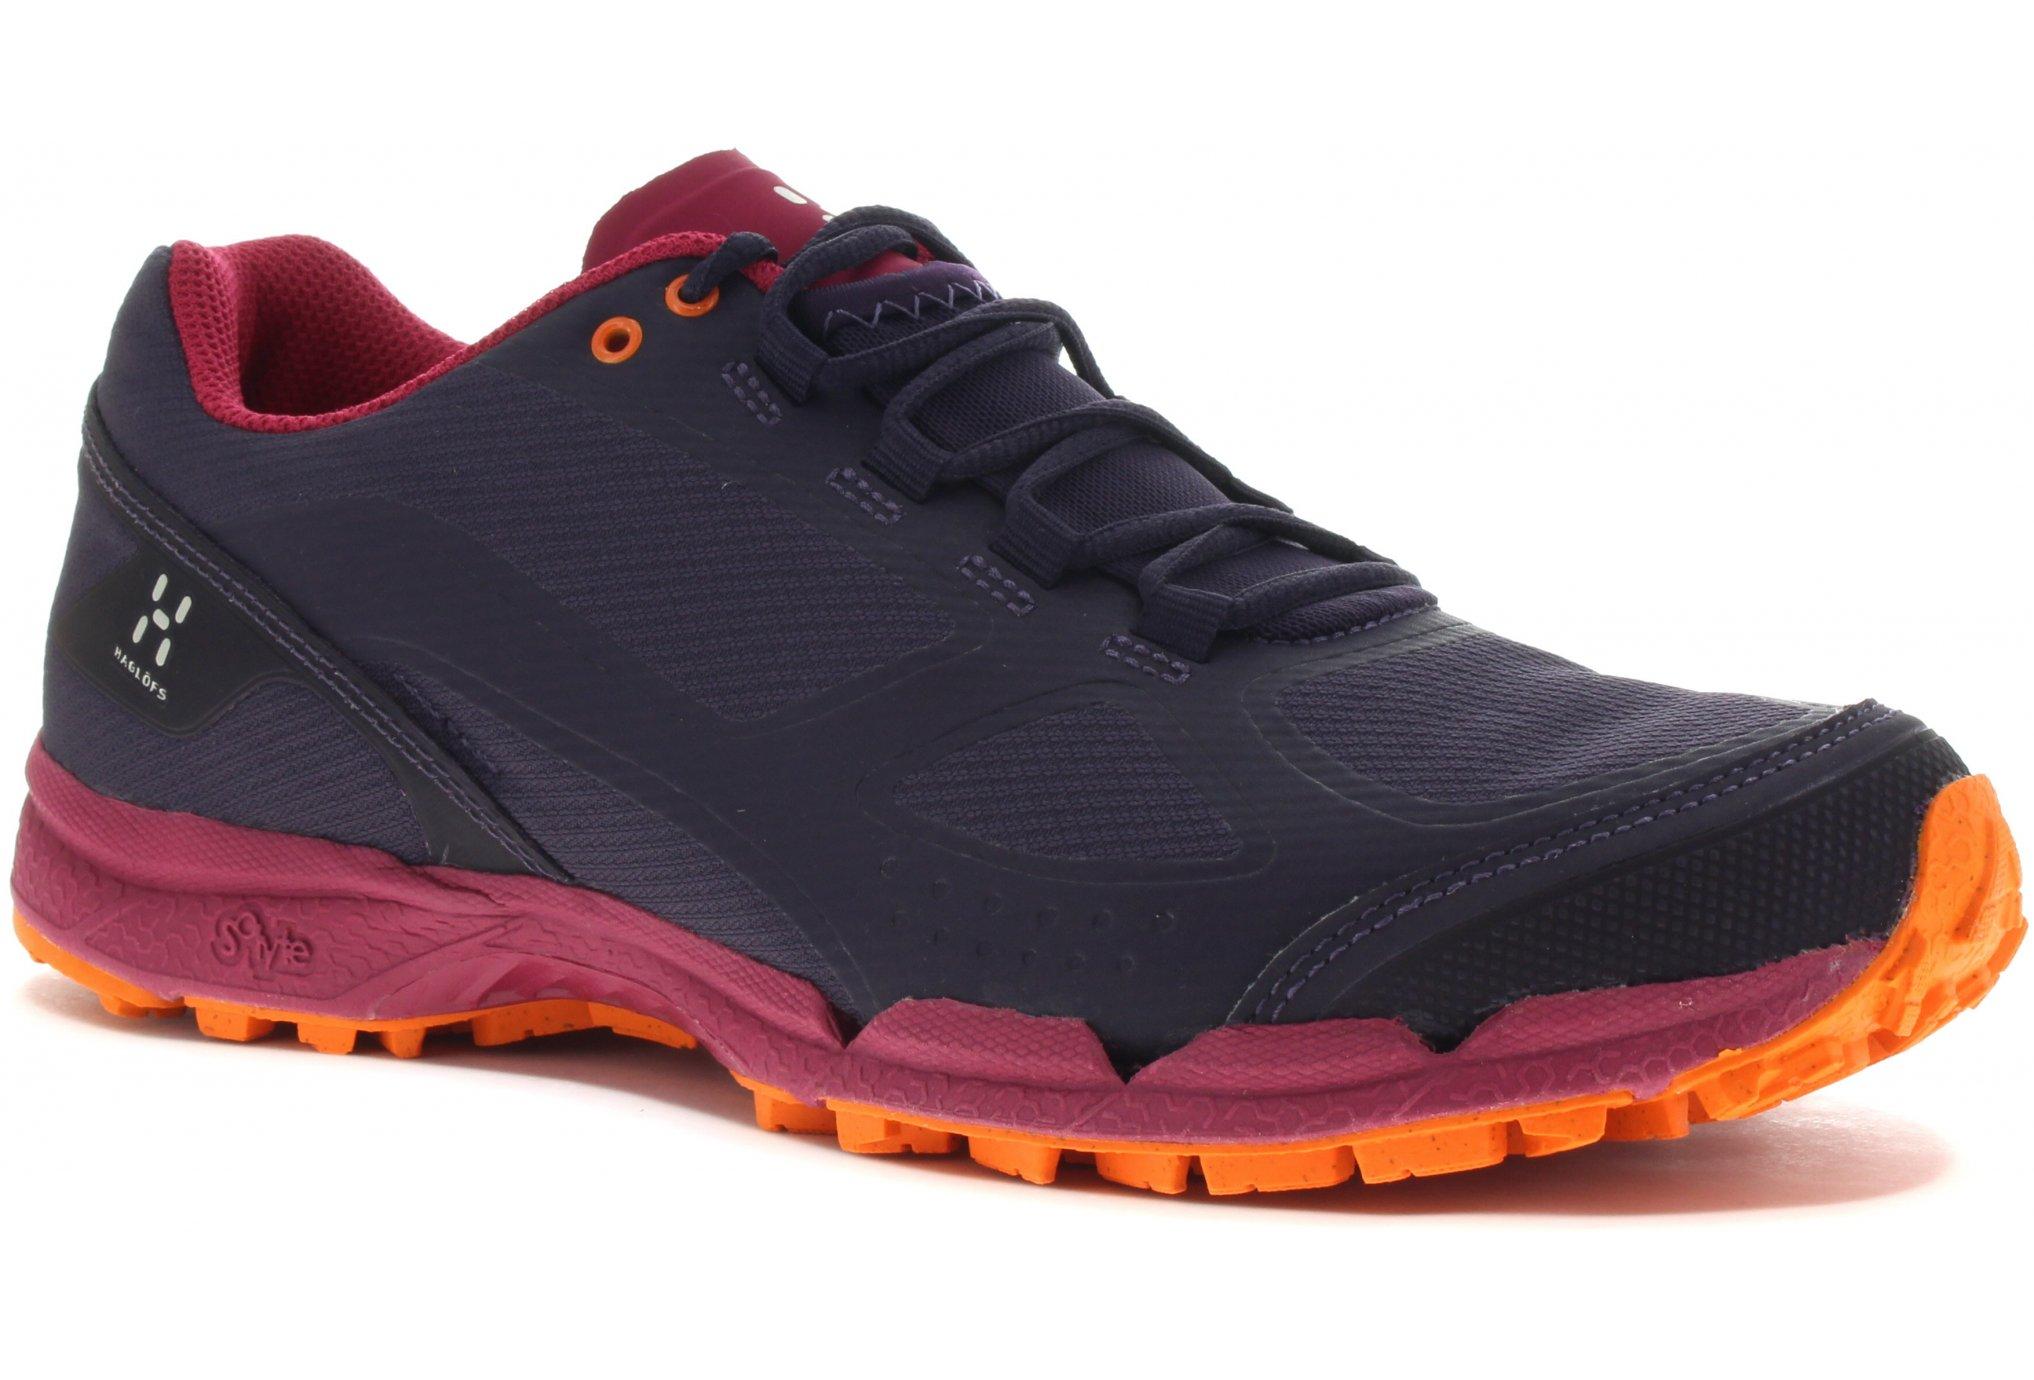 Haglöfs Gram Comp II W Diététique Chaussures femme